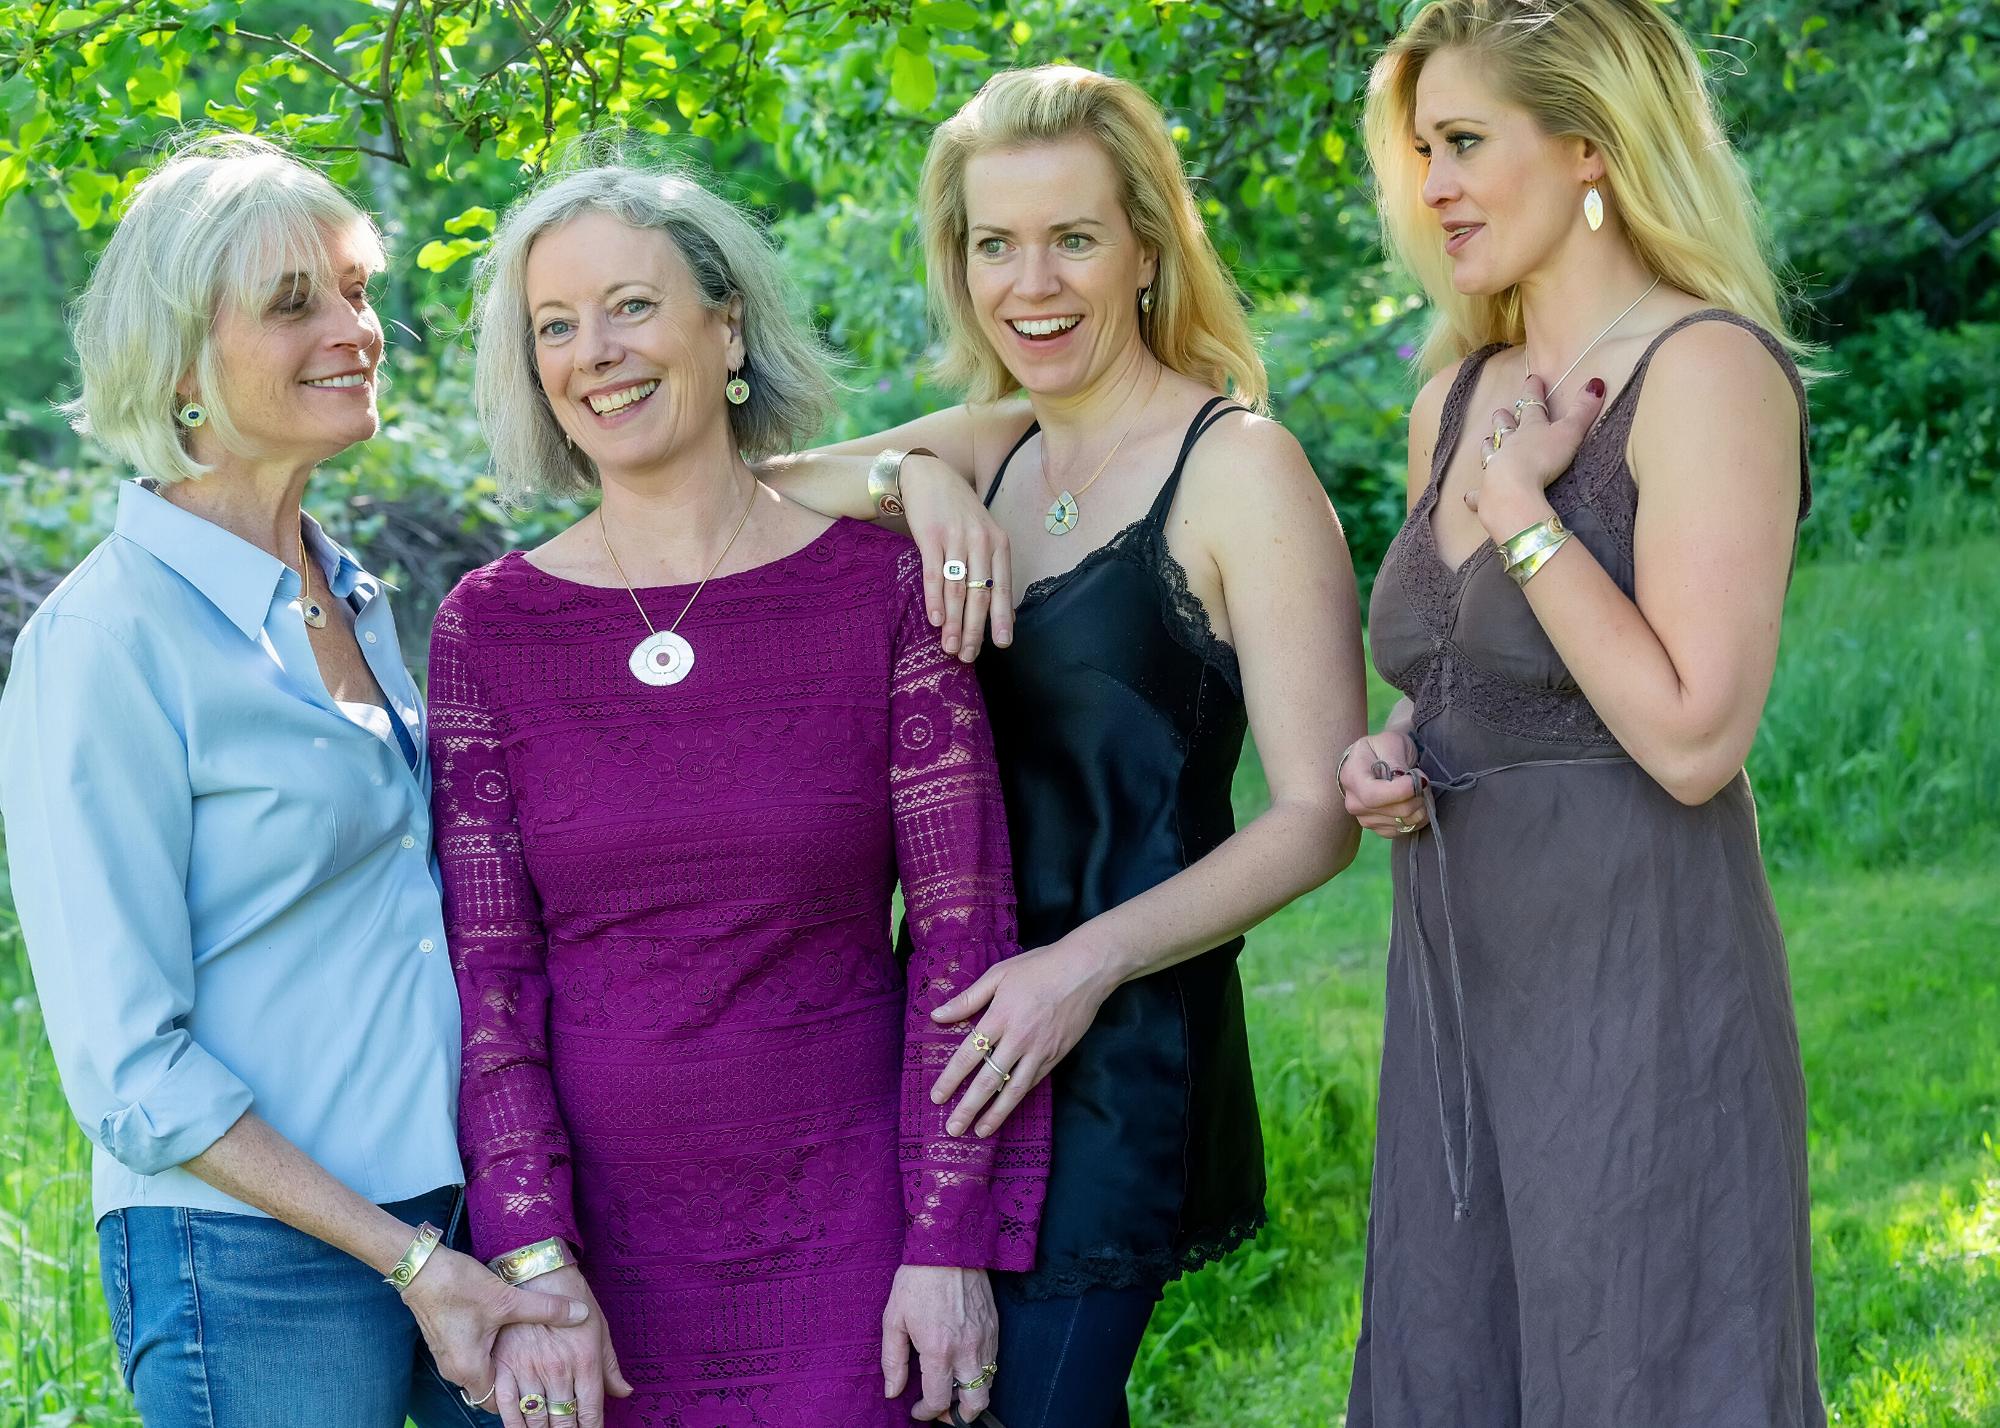 Celebrate Irish Mother's Day With Divinely Feminine Irish Symbolic Jewelry | Jewelry Inspired By Irish Symbols | By Deirdre Donnelly Jewelry Art